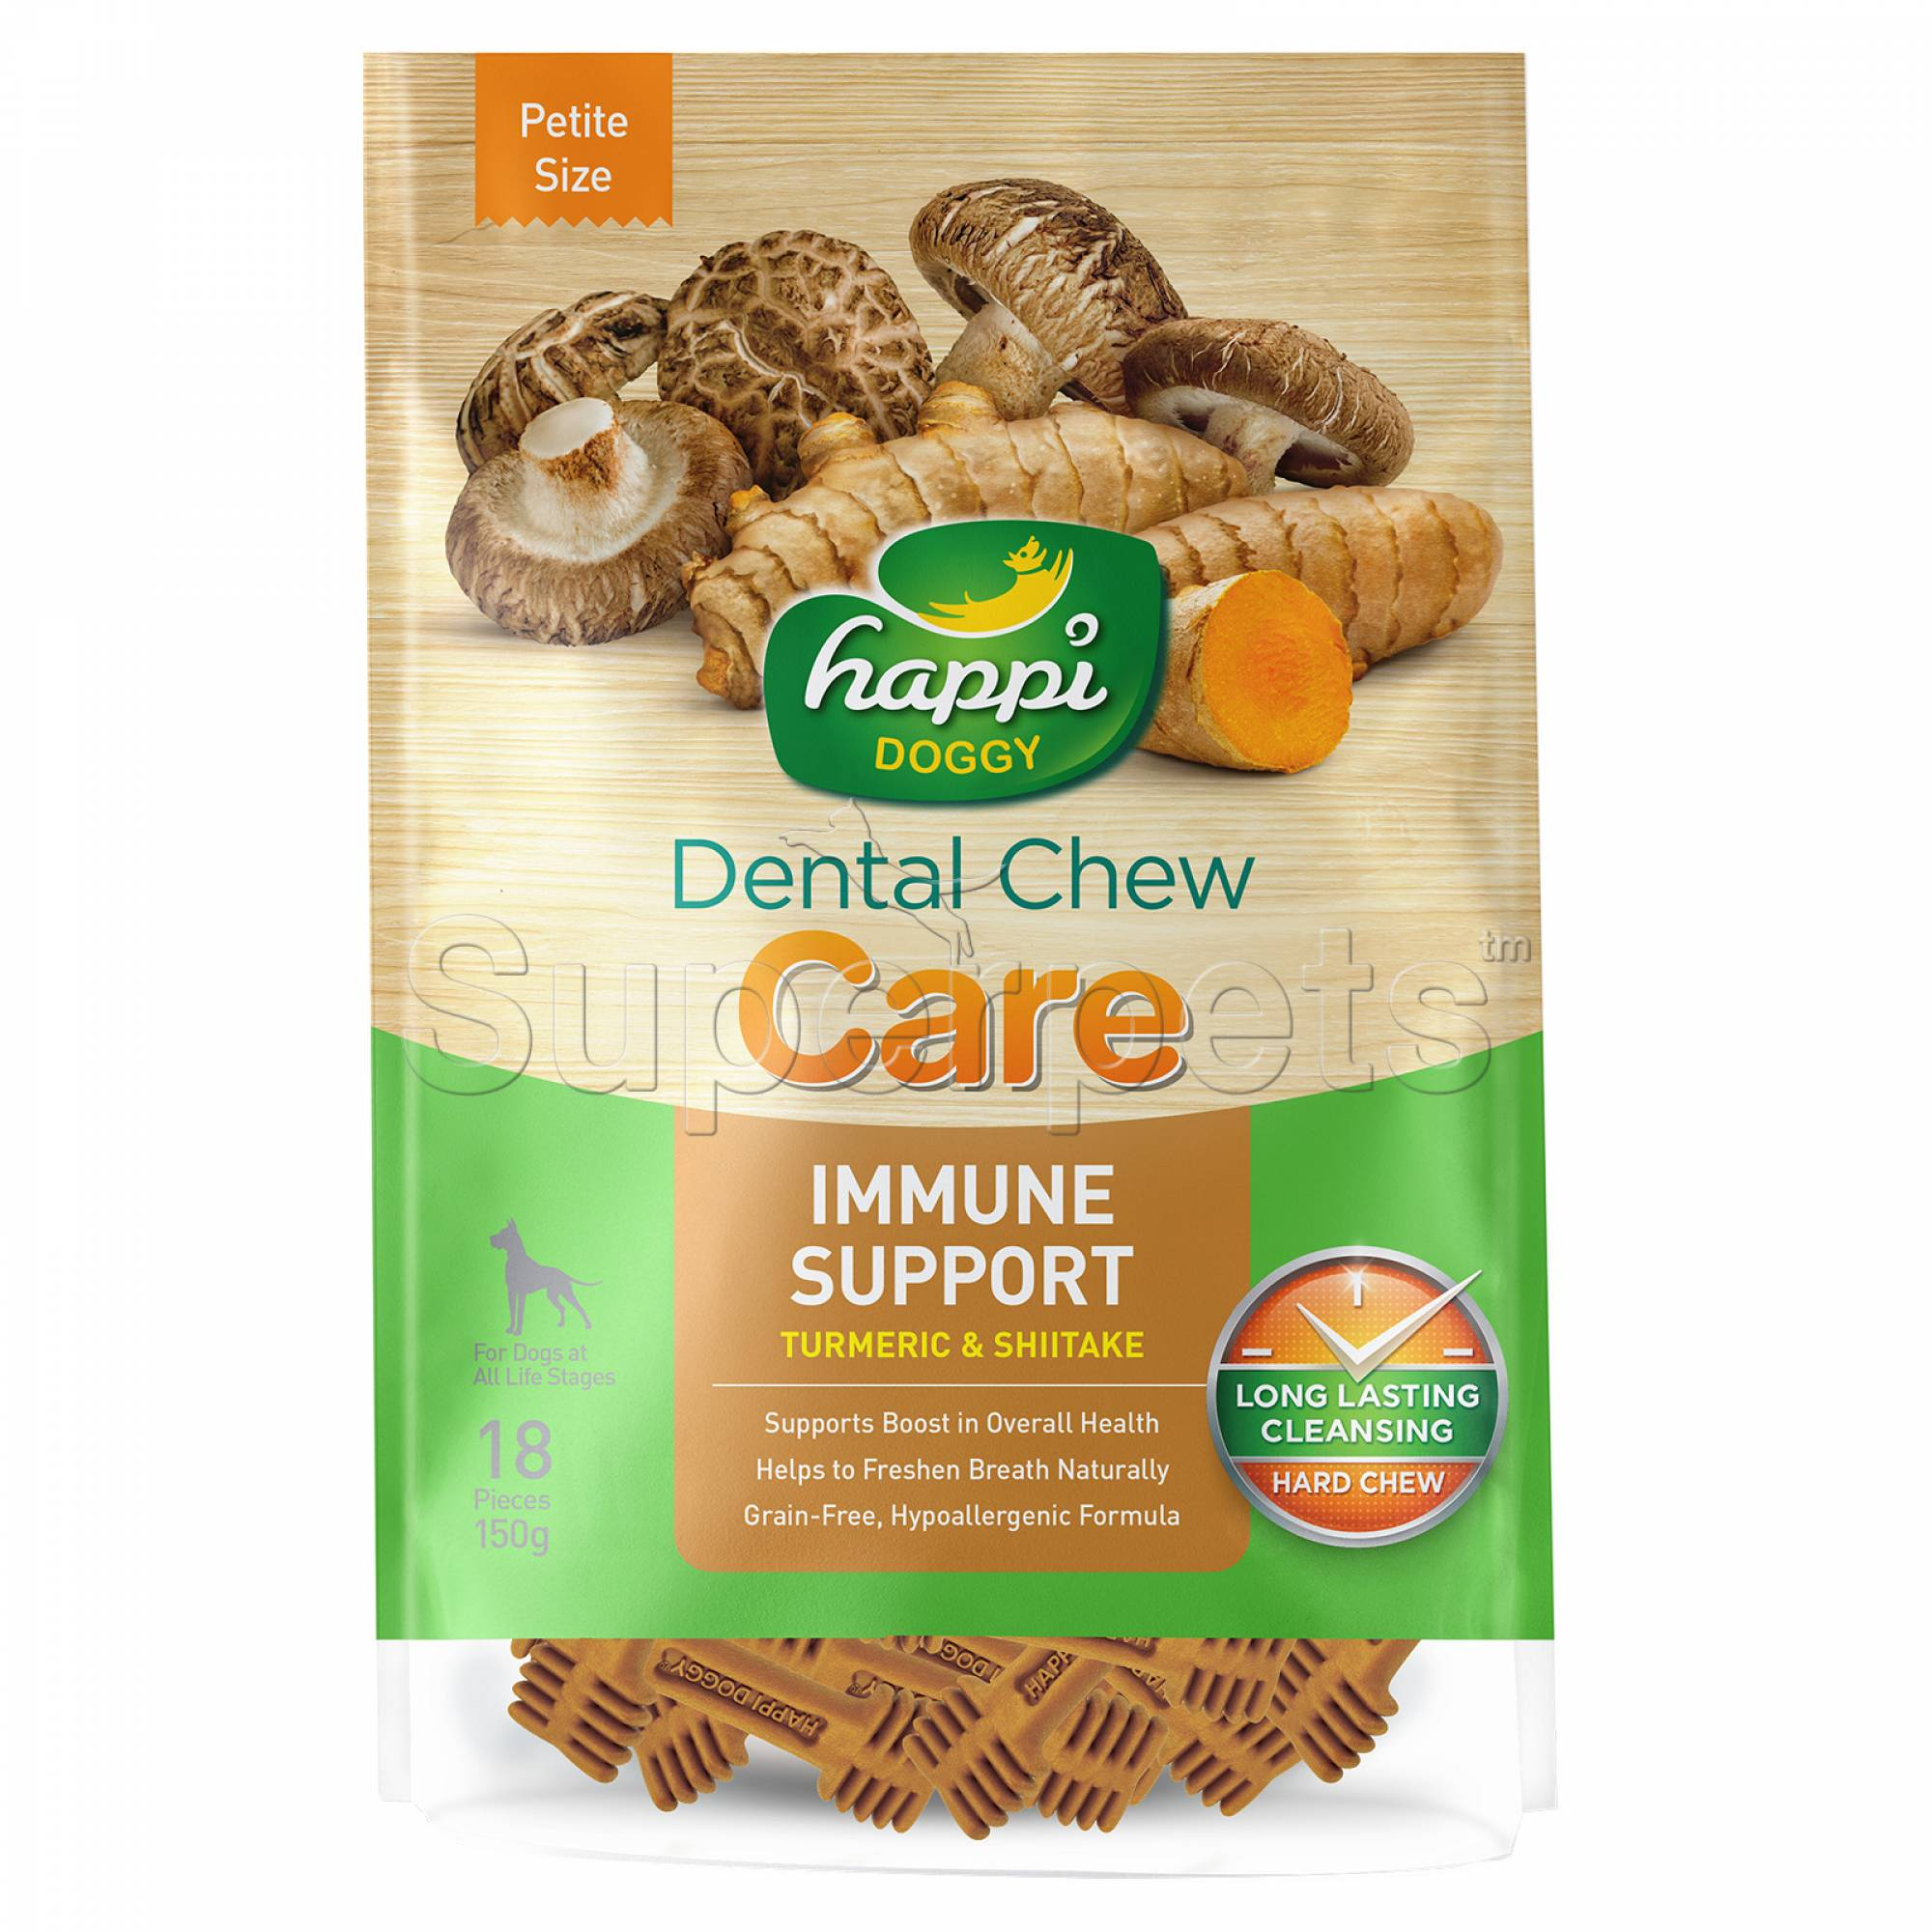 Happi Doggy H311 Dental Chew Care (Immune Support) Petite Size 18pcs 150g